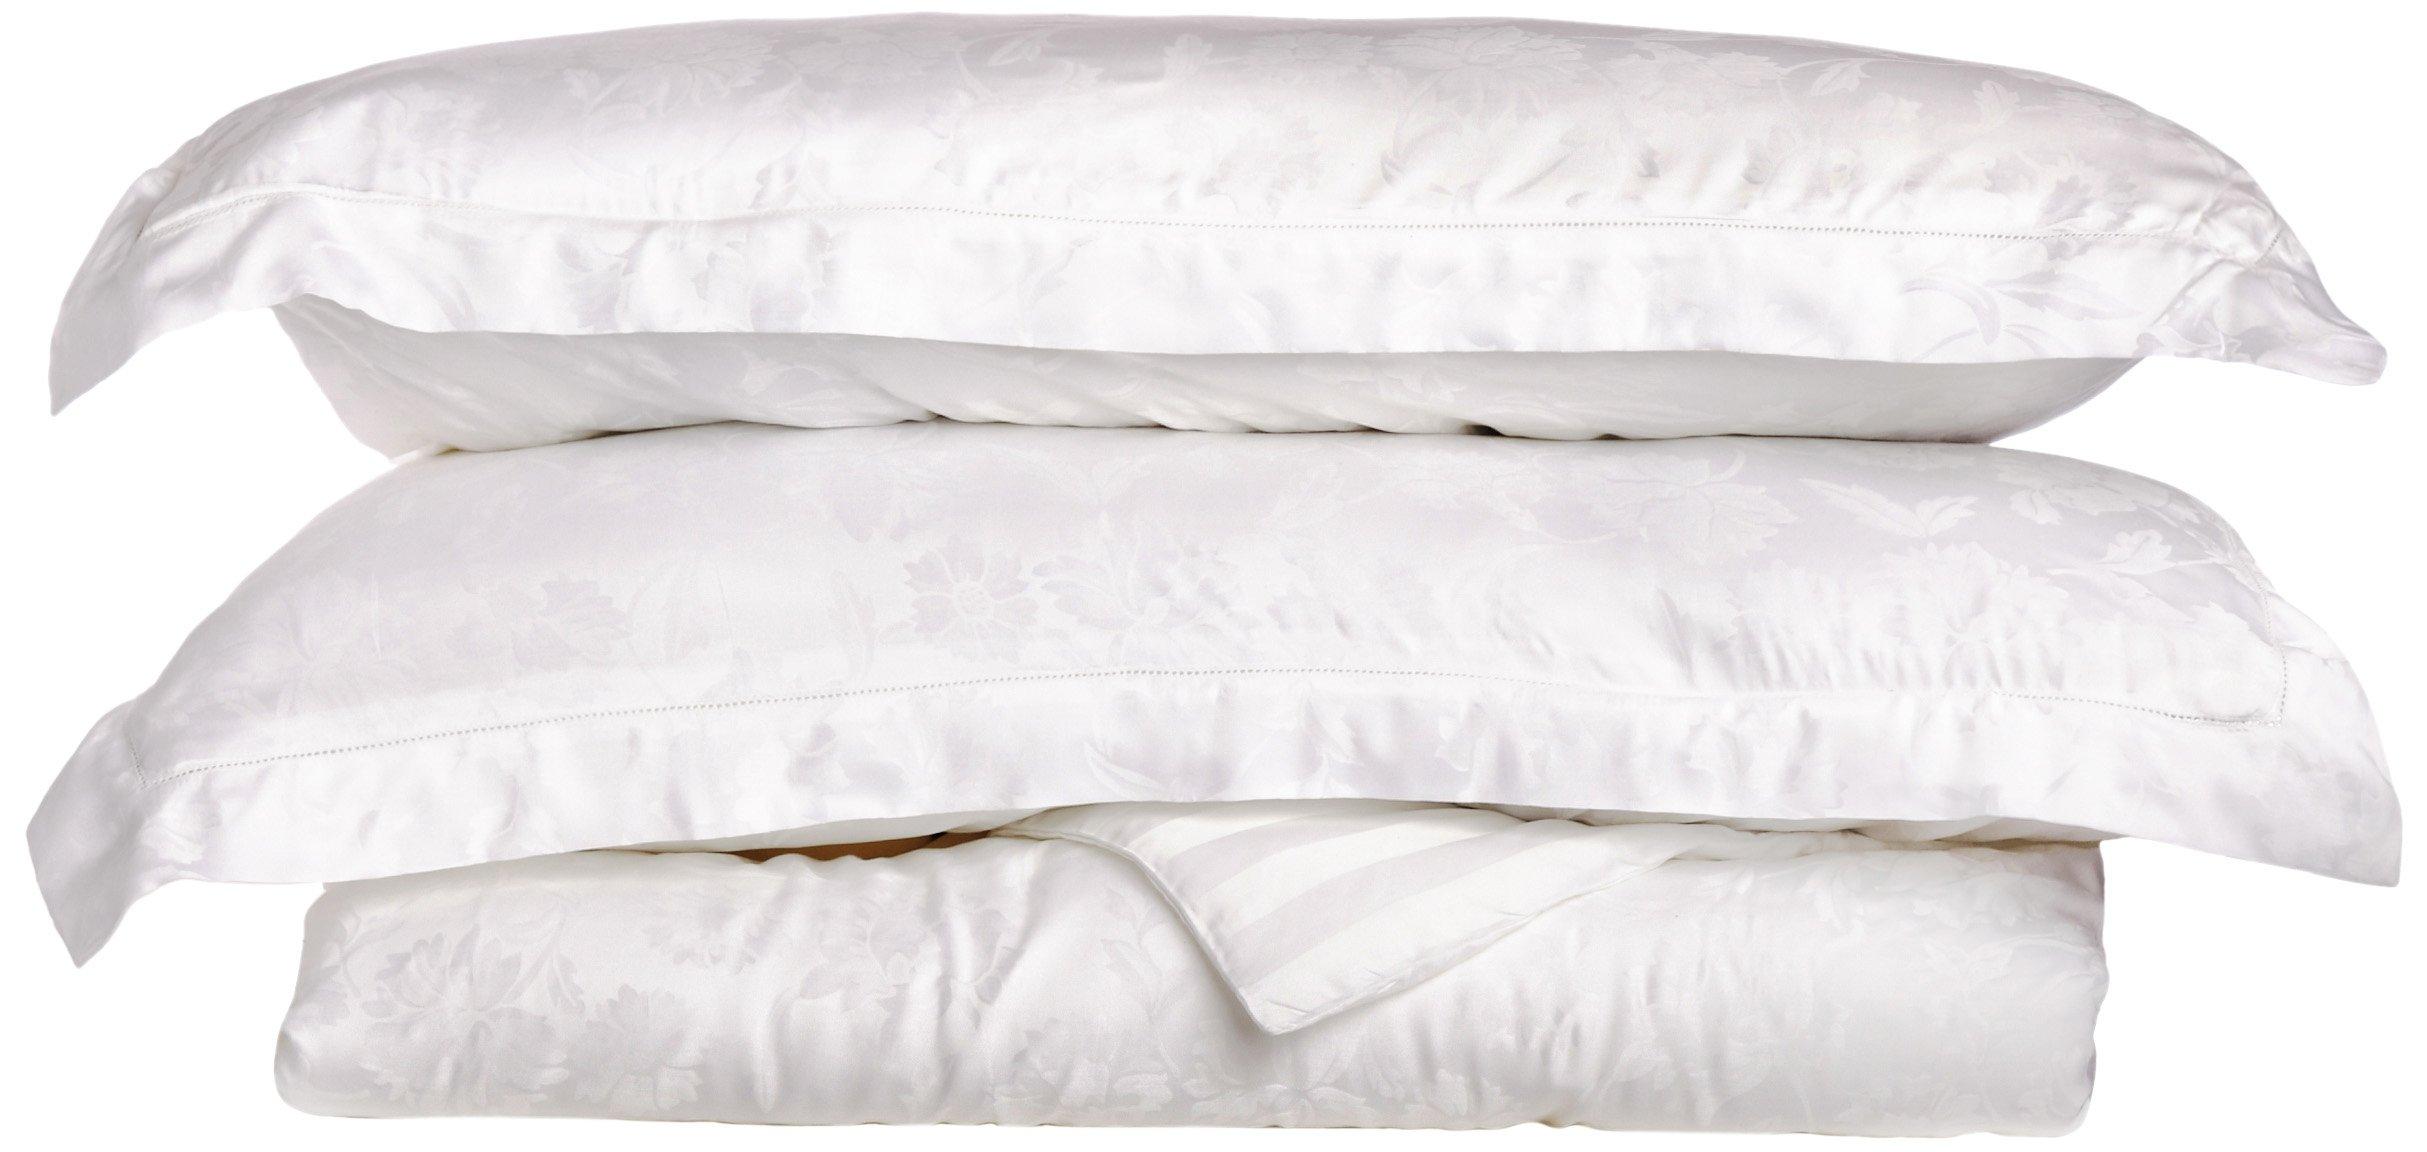 Tuscany Fine Linens Livorno 100-Percent Beechwood Modal Duvet Cover Set, White, King by Tuscany Fine Linens (Image #1)